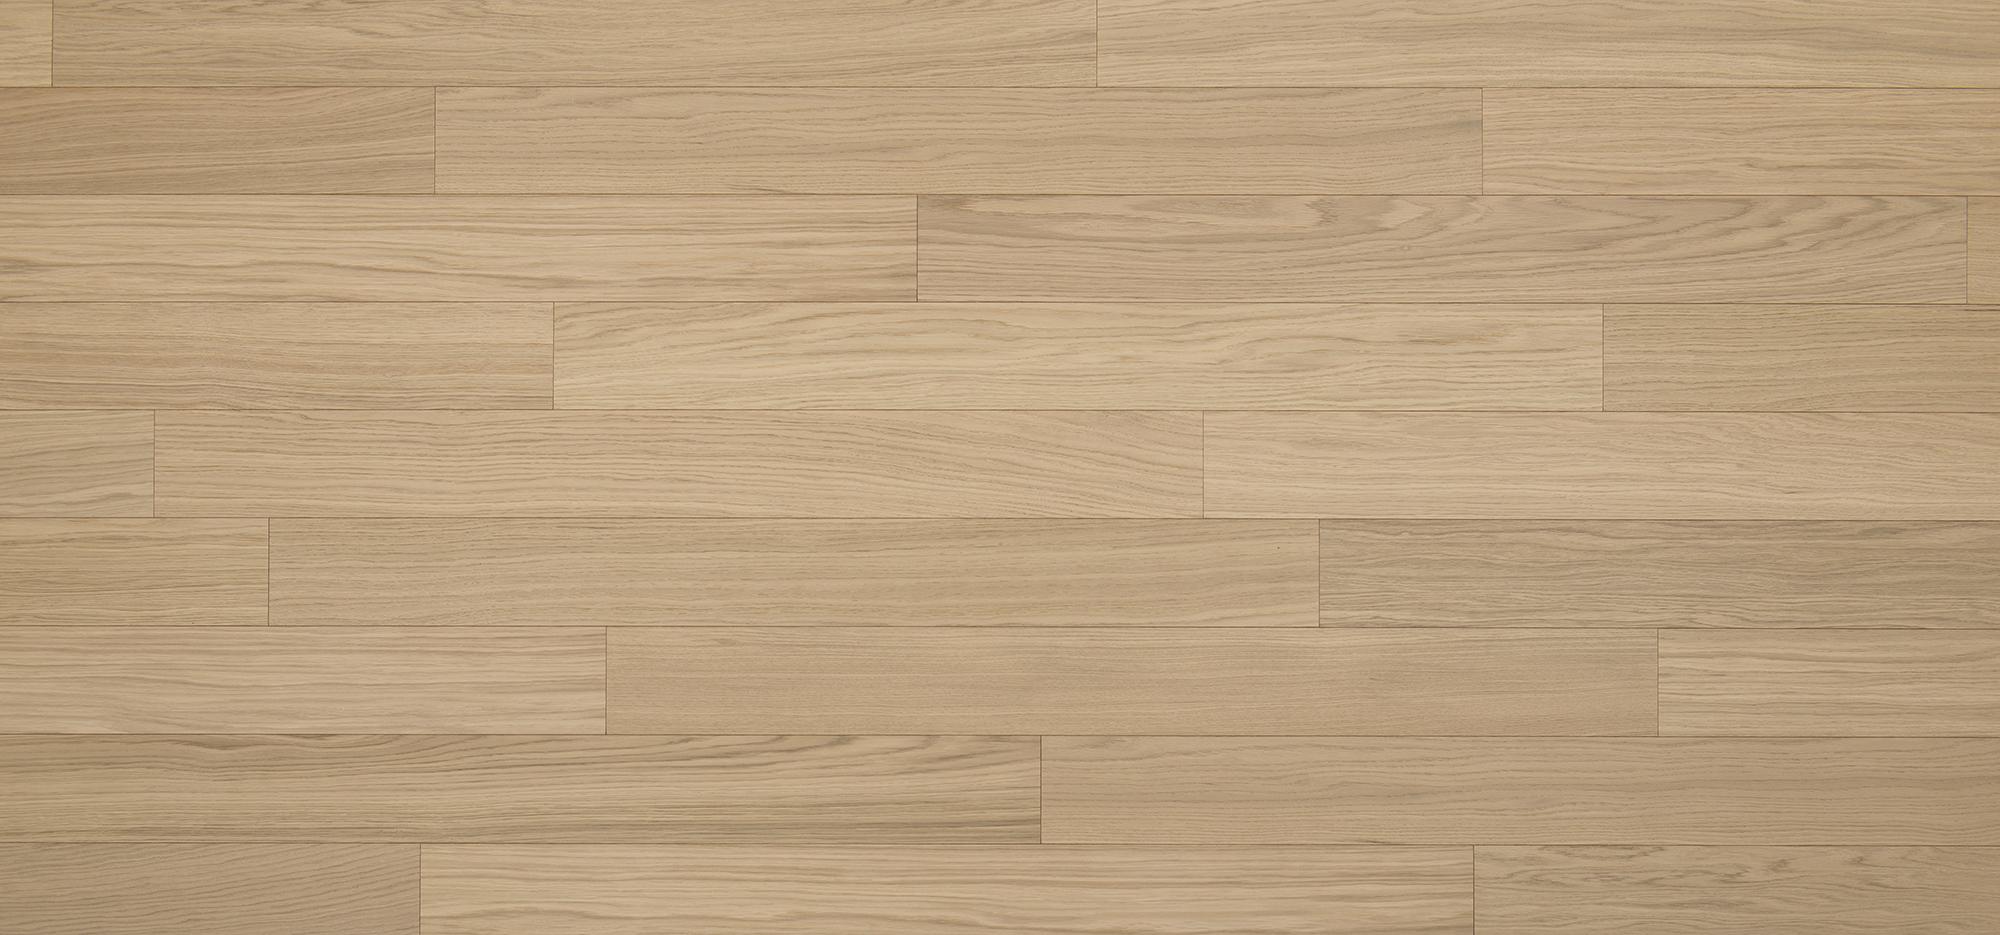 top par ky elfenbein eiche premium pure deluxe 06. Black Bedroom Furniture Sets. Home Design Ideas